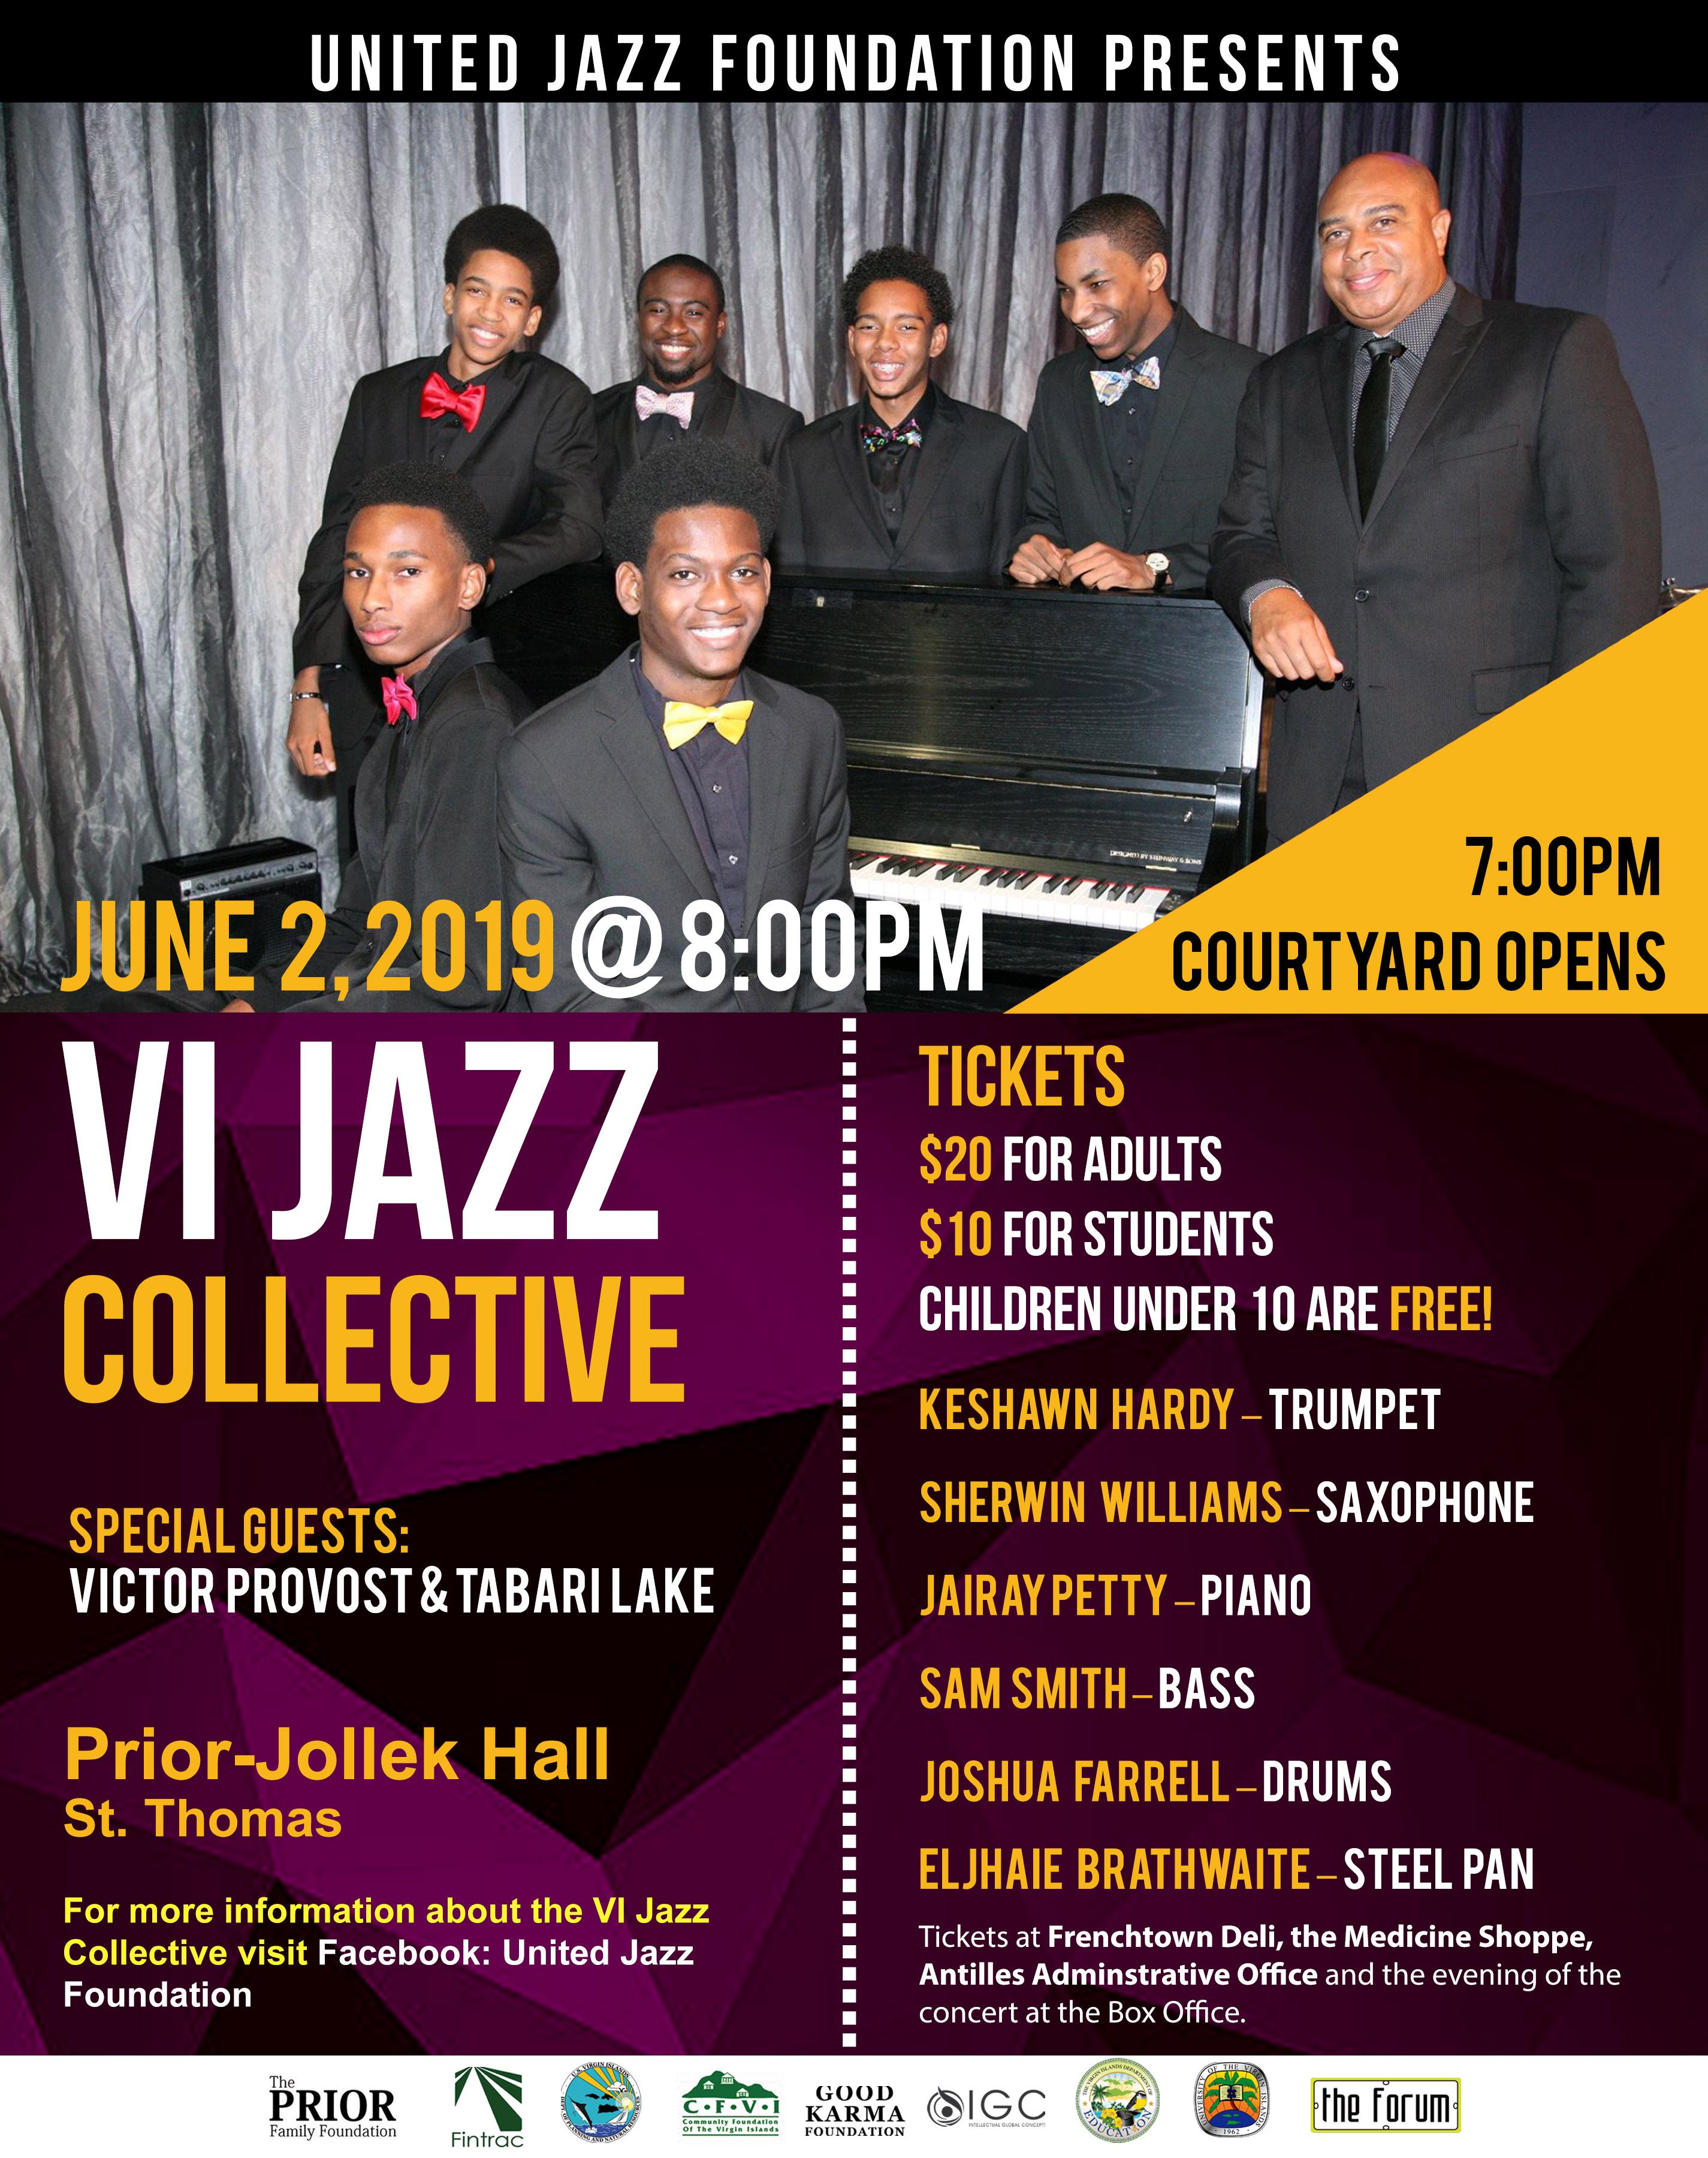 VI Jazz Collective kicks off tour